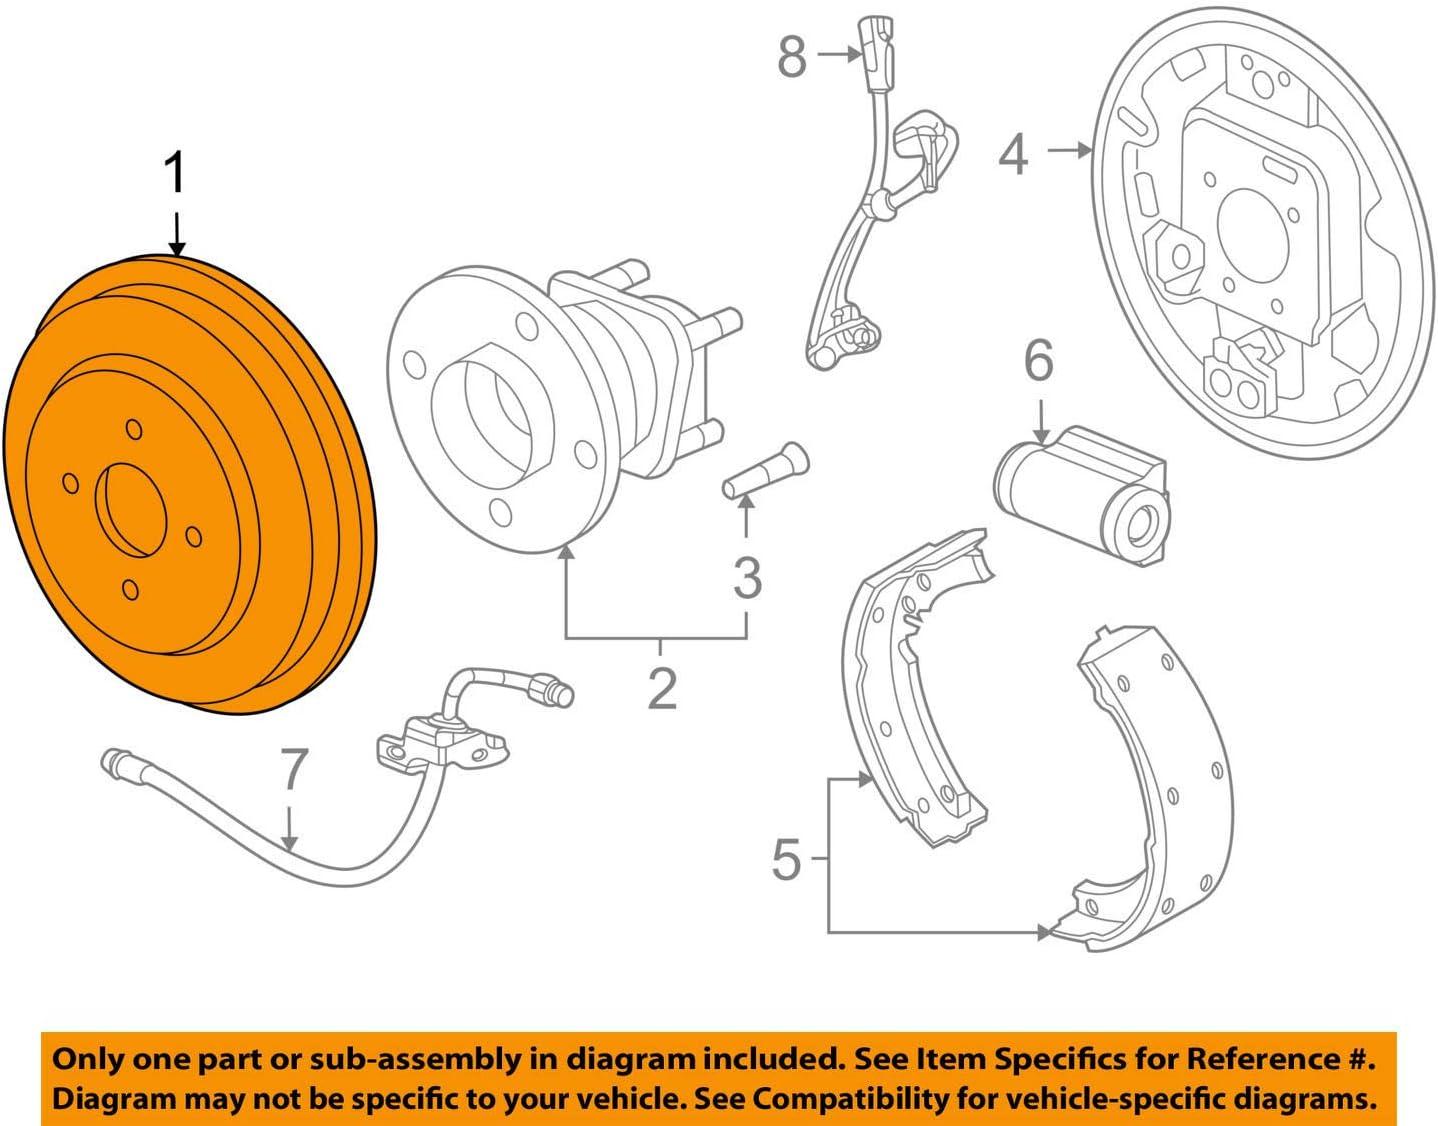 Amazon.com: General Motors 13435981, Brake Drum: AutomotiveAmazon.com